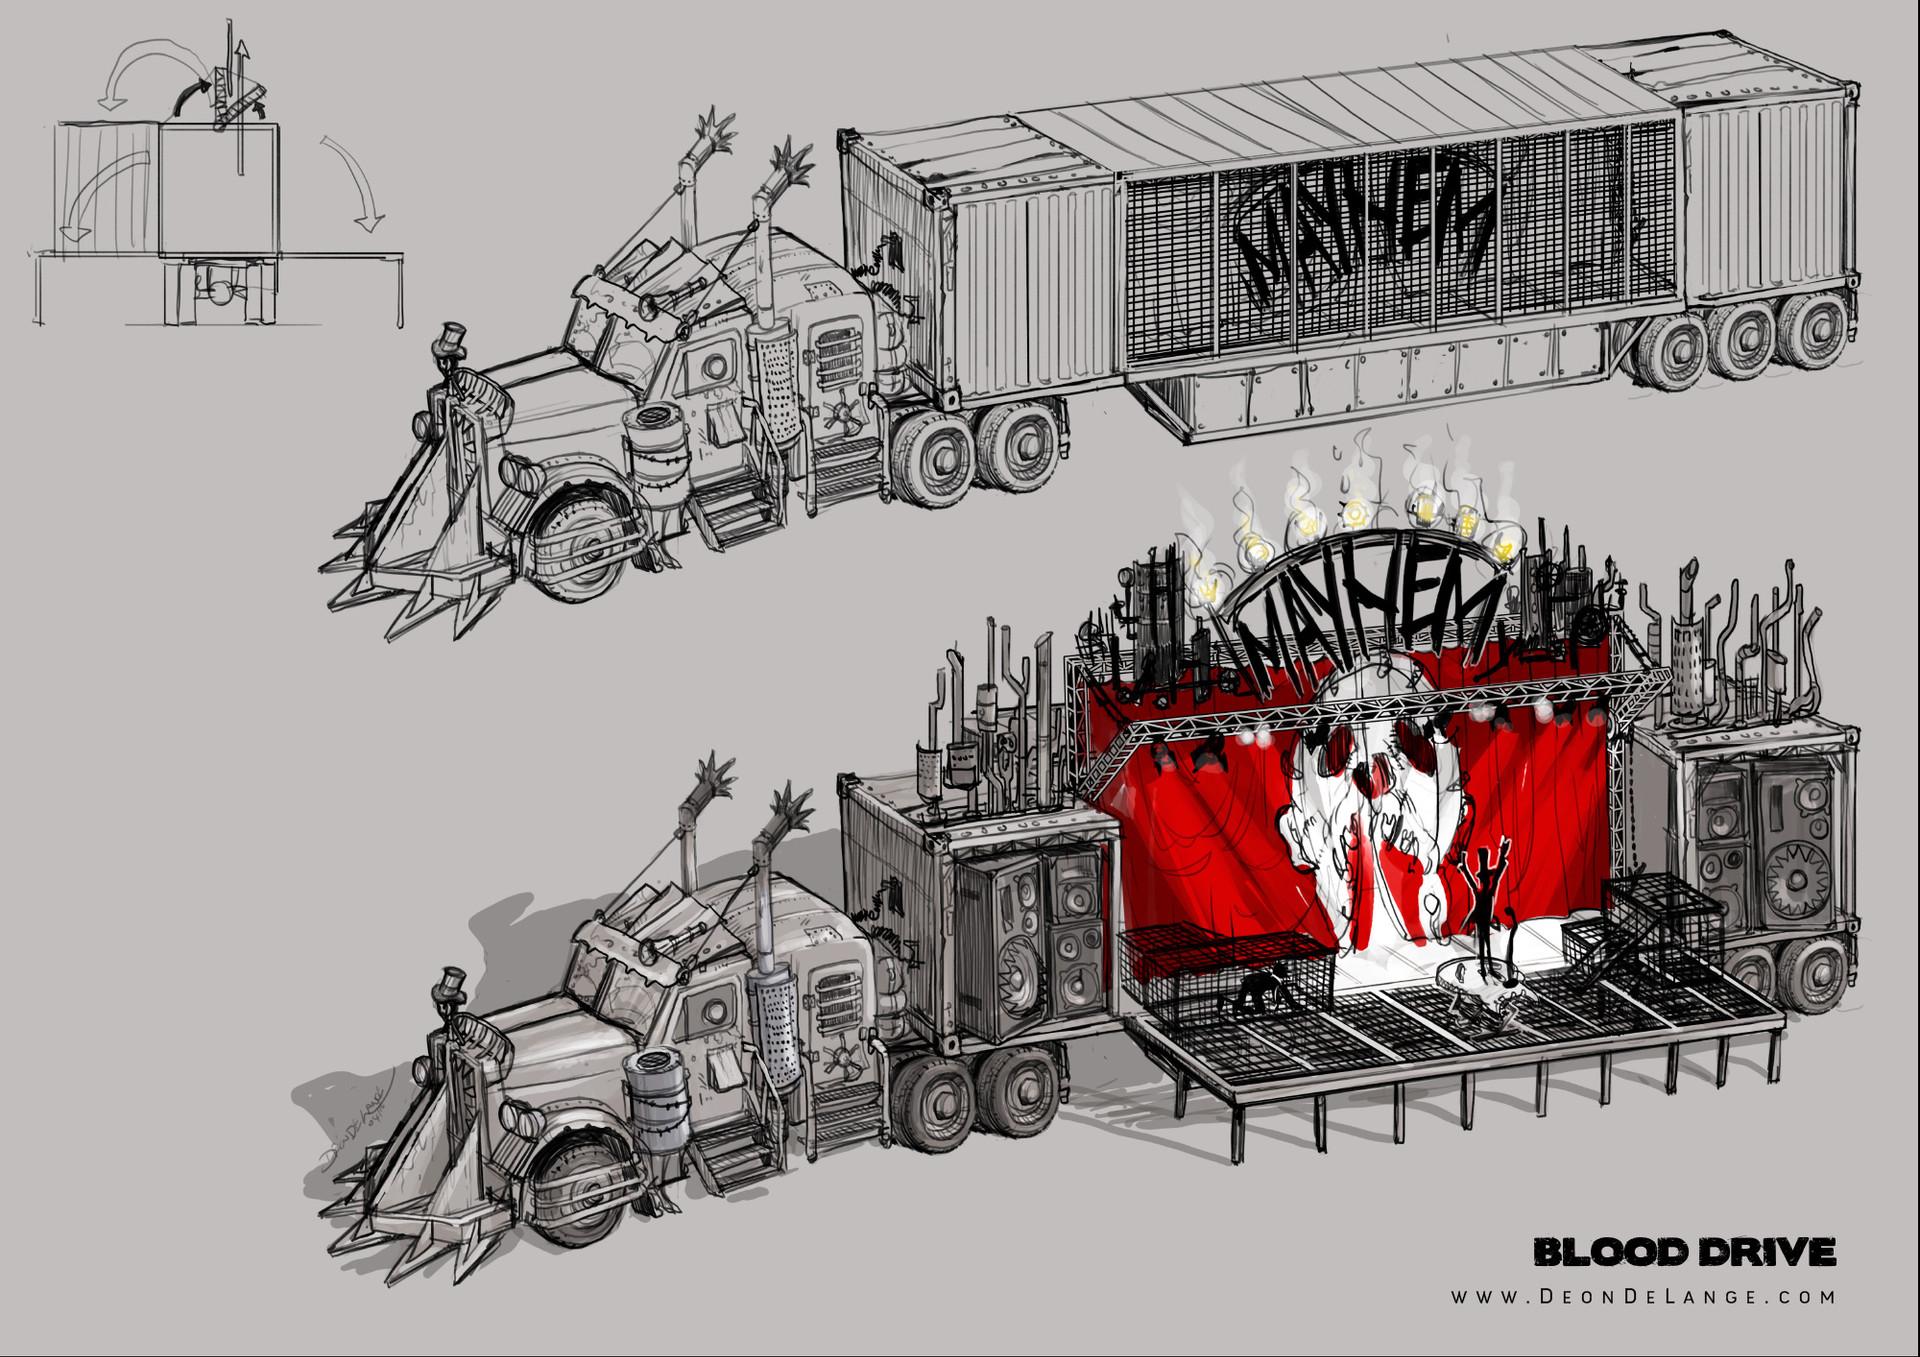 DeonDeLange_BloodDrive_Truck.jpg